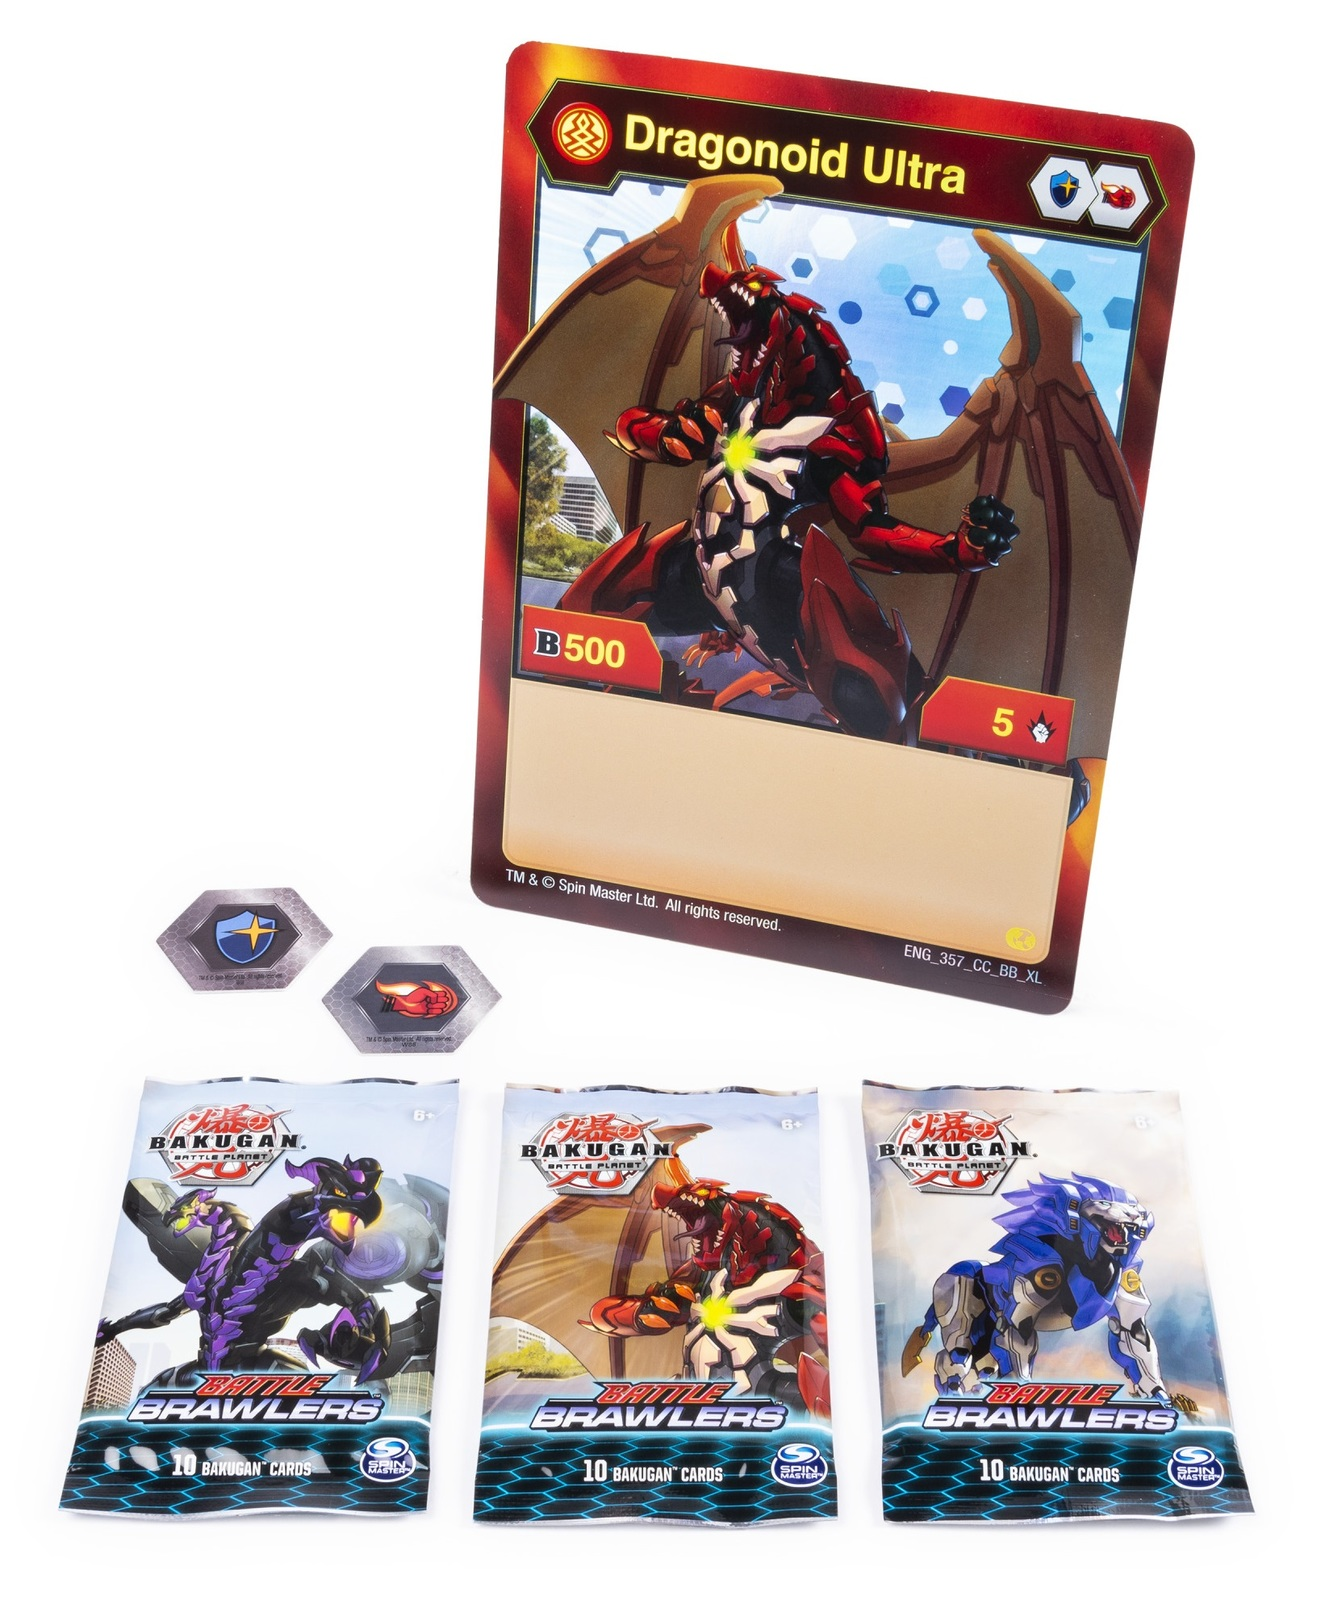 Bakugan Battle Brawlers Card Collection With 2 Bakucores Nib